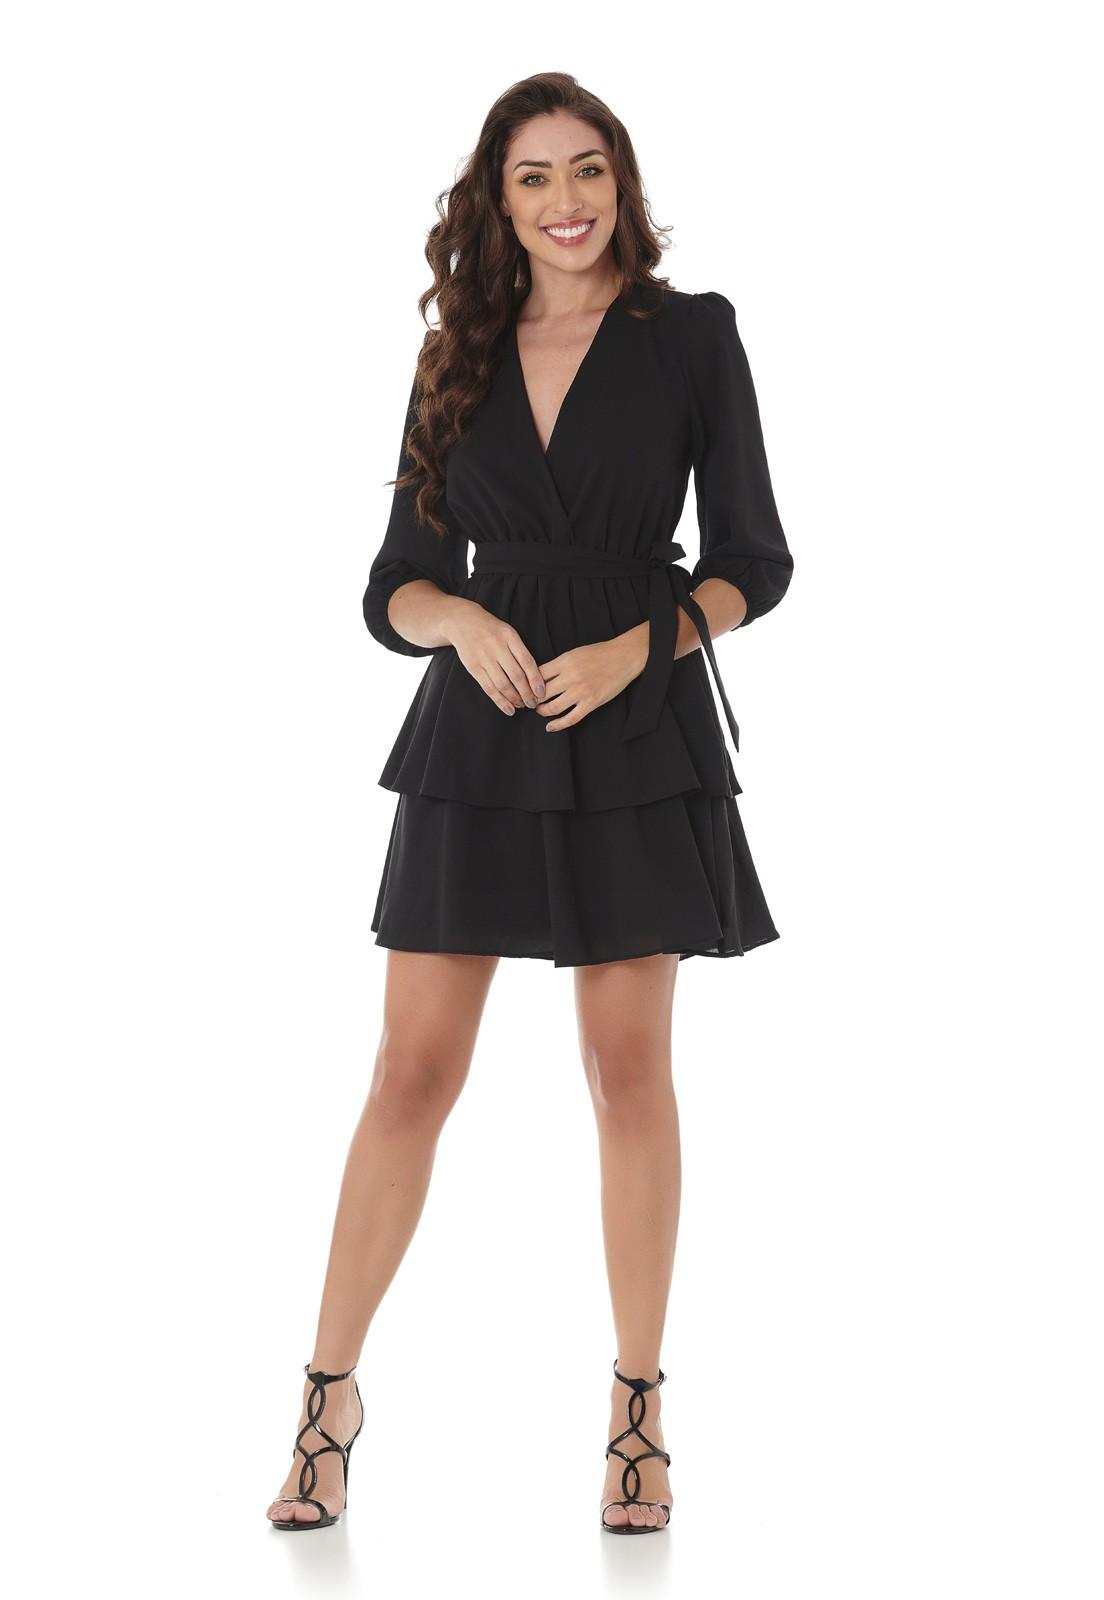 Vestido Curto Camadas Preto Lala Dubi